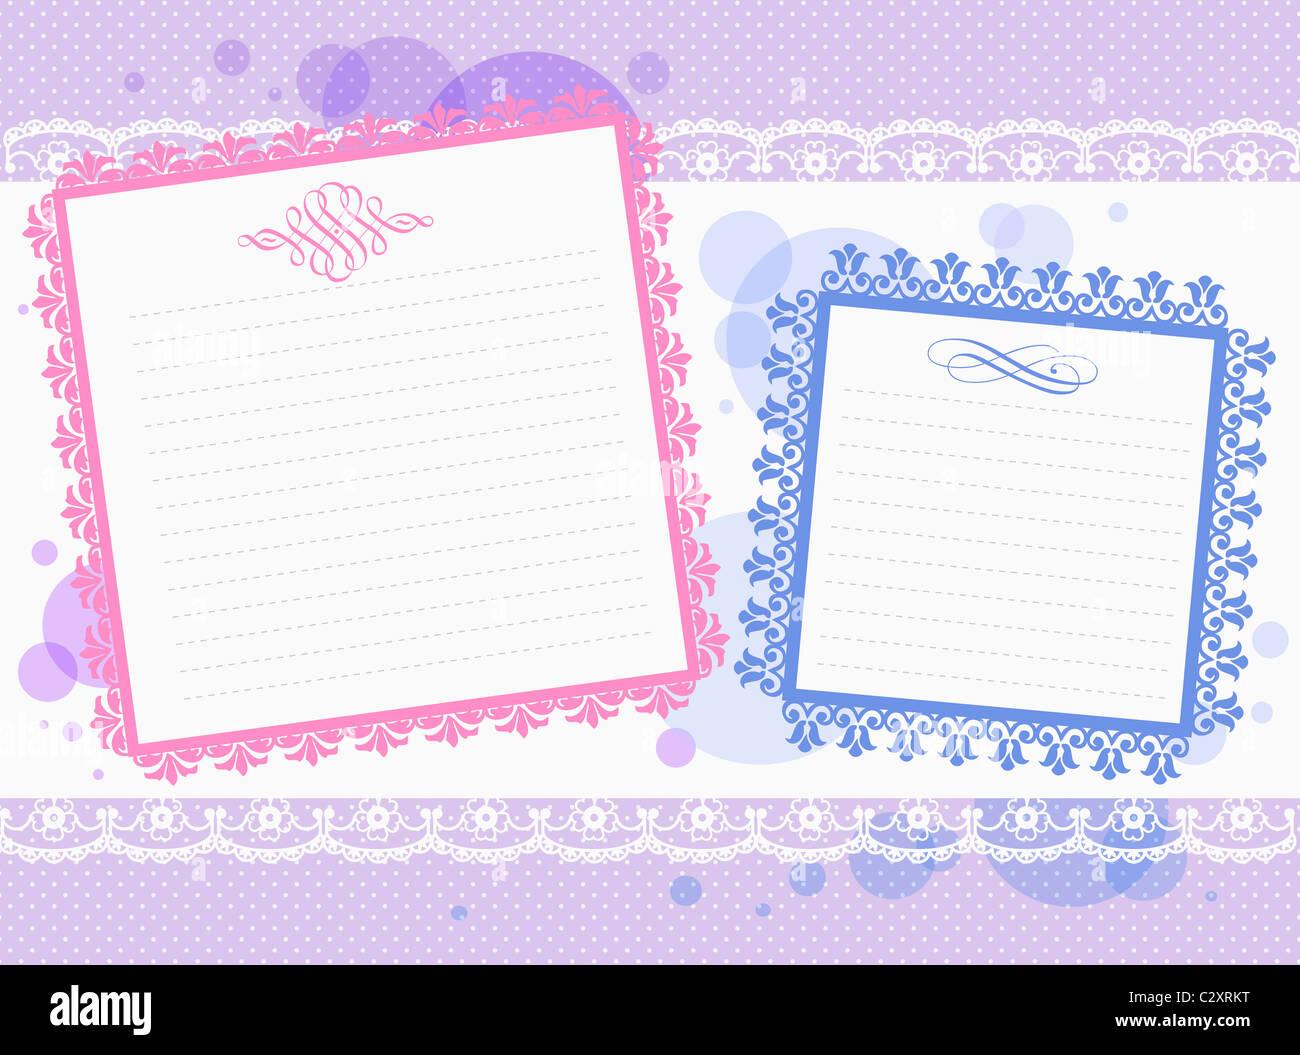 fancy letter paper backdrop stock photo 36239388 alamy